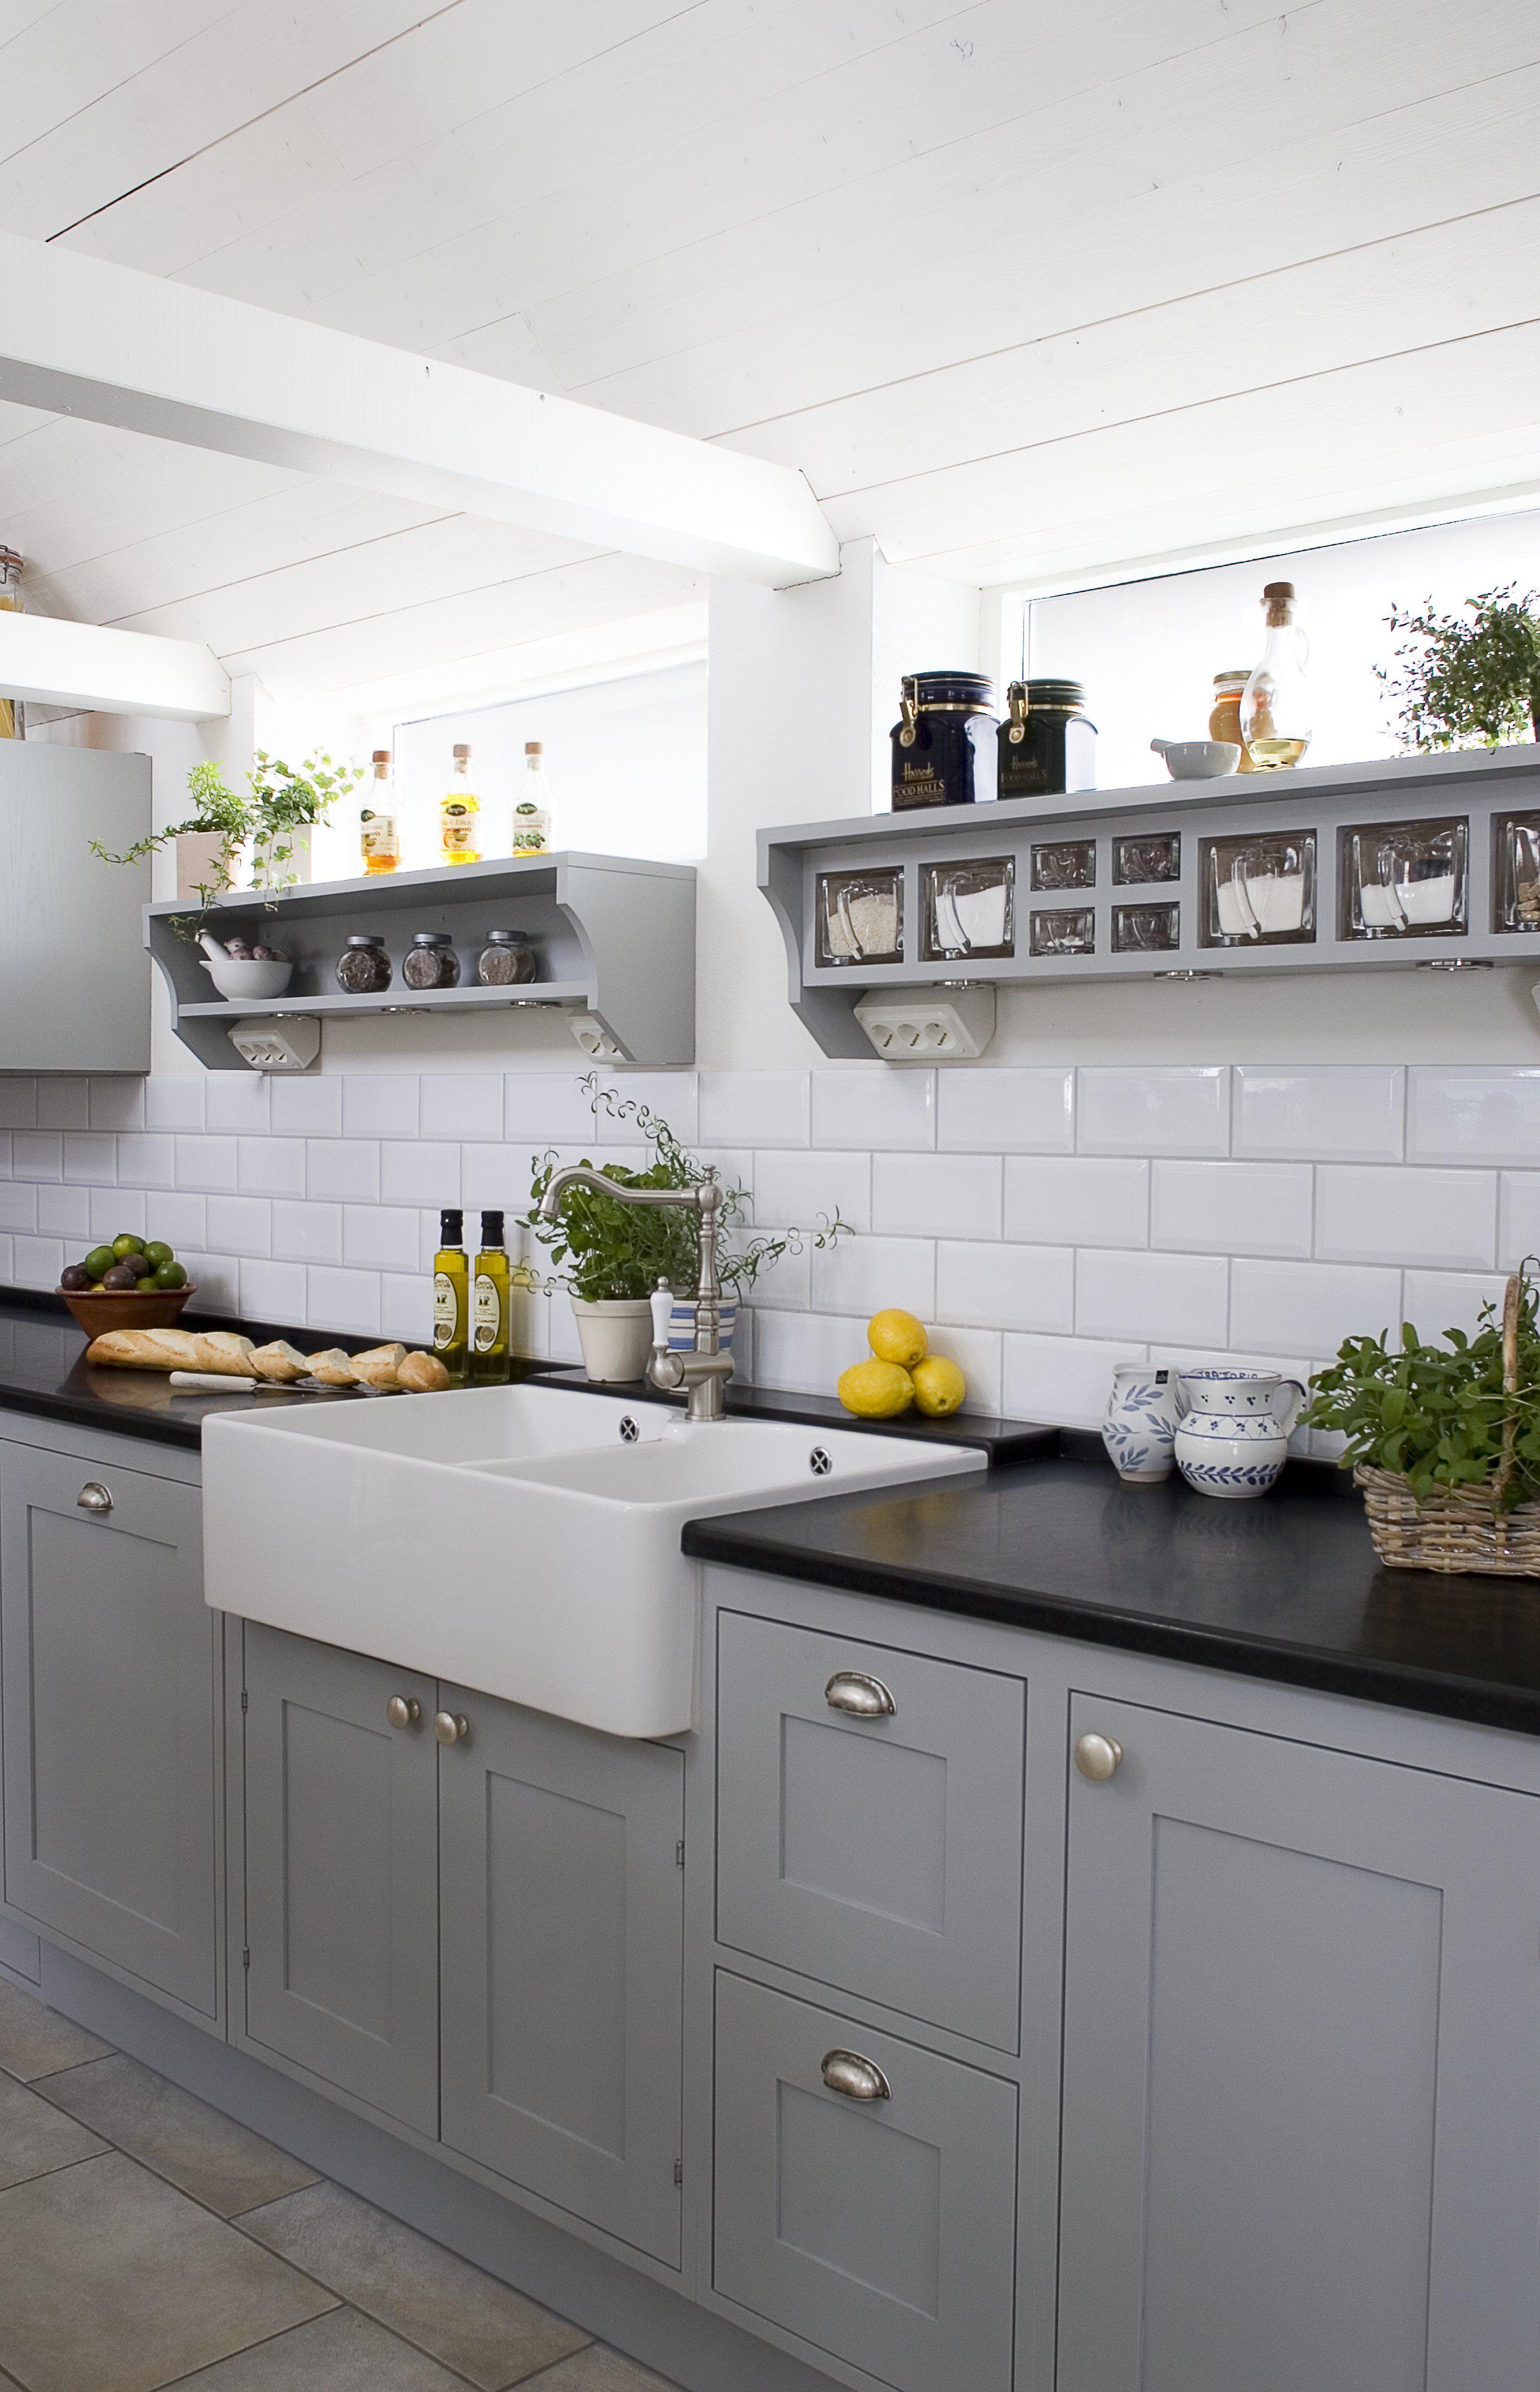 Kitchen in Grey, notice the famous Swedish glass jars in the shelf #Scandinavianstyle #Greykitchen #Glassjar #SolaKitchens